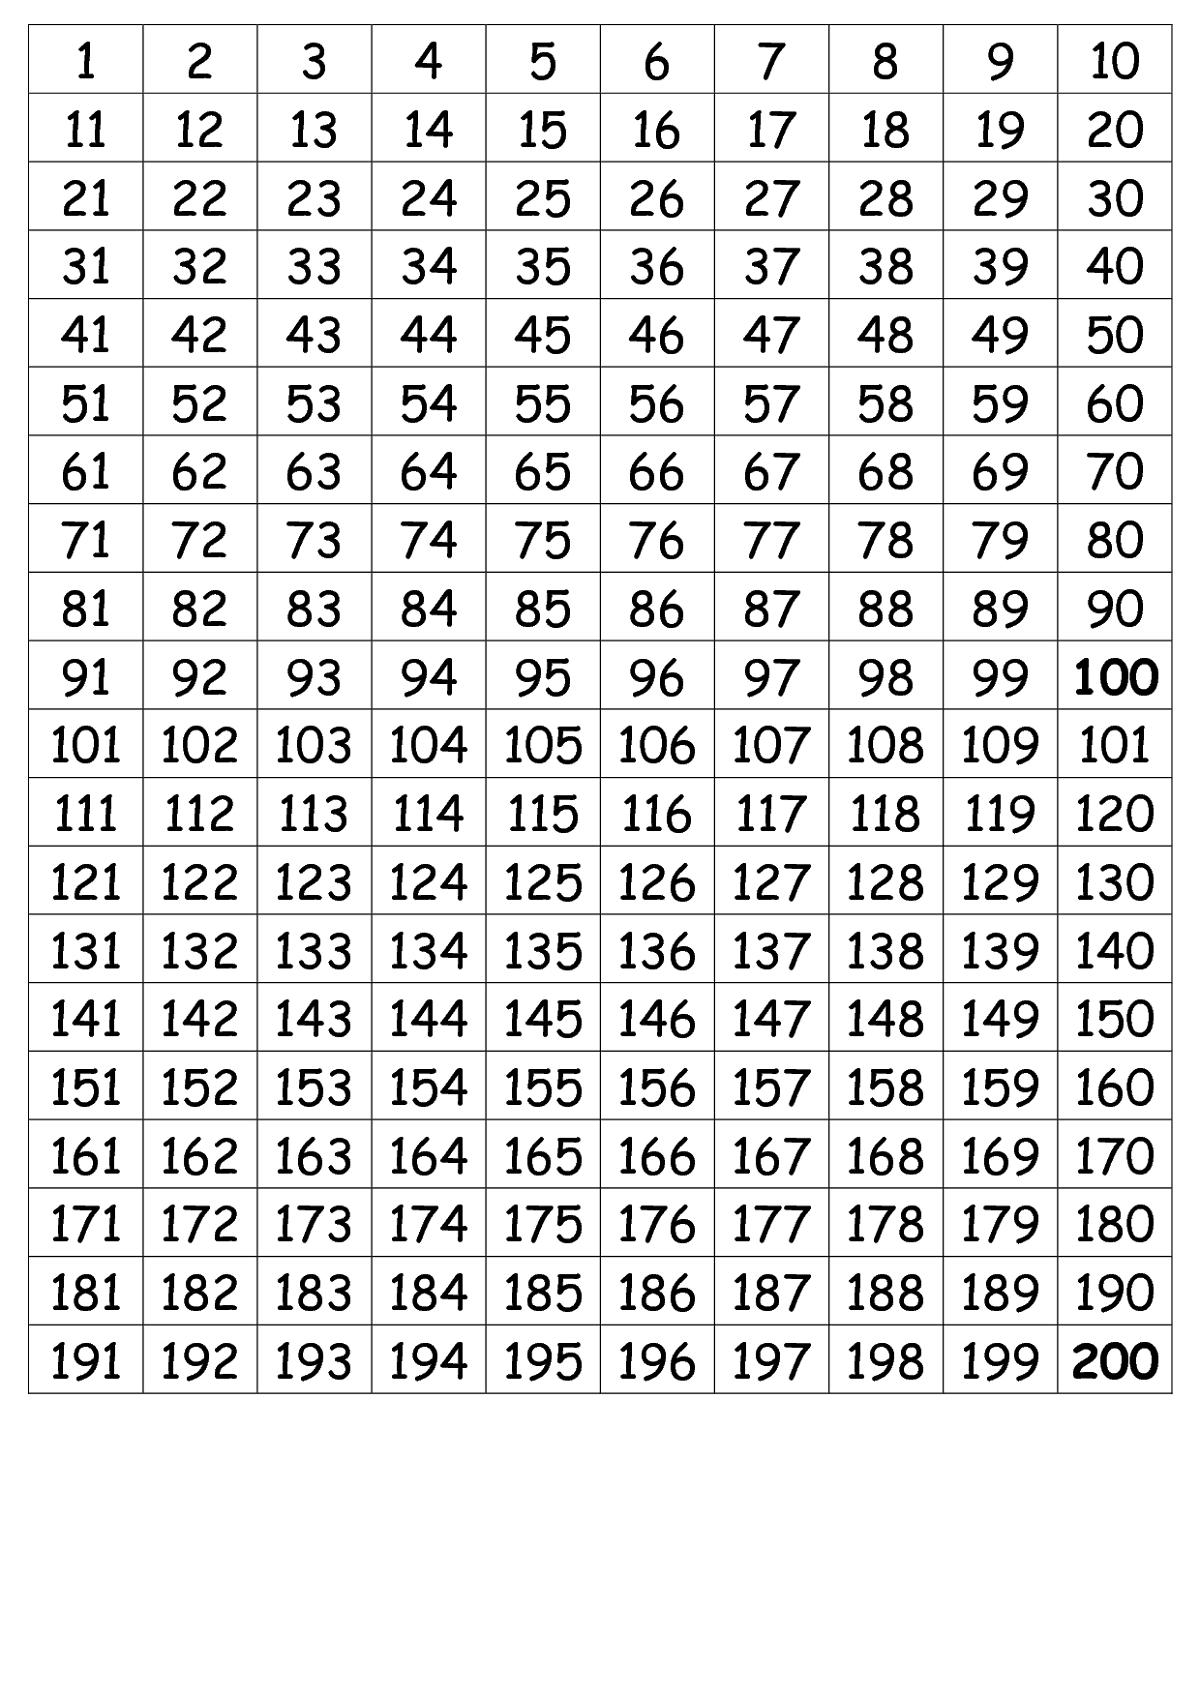 Printable Number Chart 101 200 Worksheets